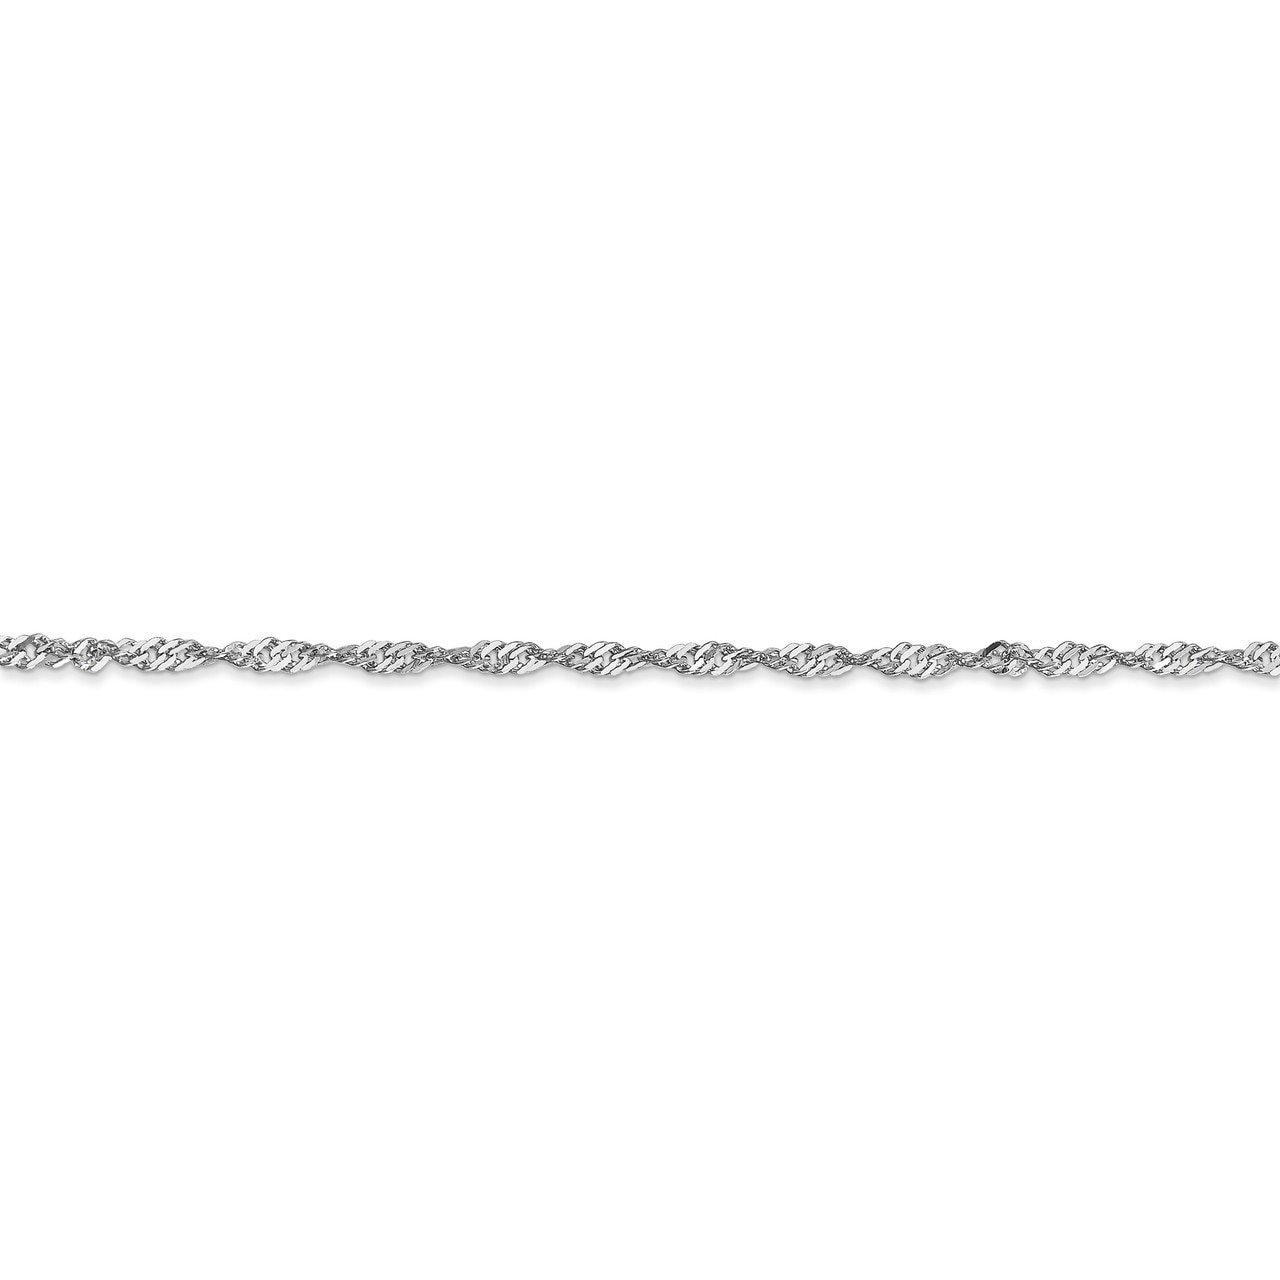 Bracelet or Anklet Lex /& Lu 14k White Gold 1.7mm Singapore Chain Necklace